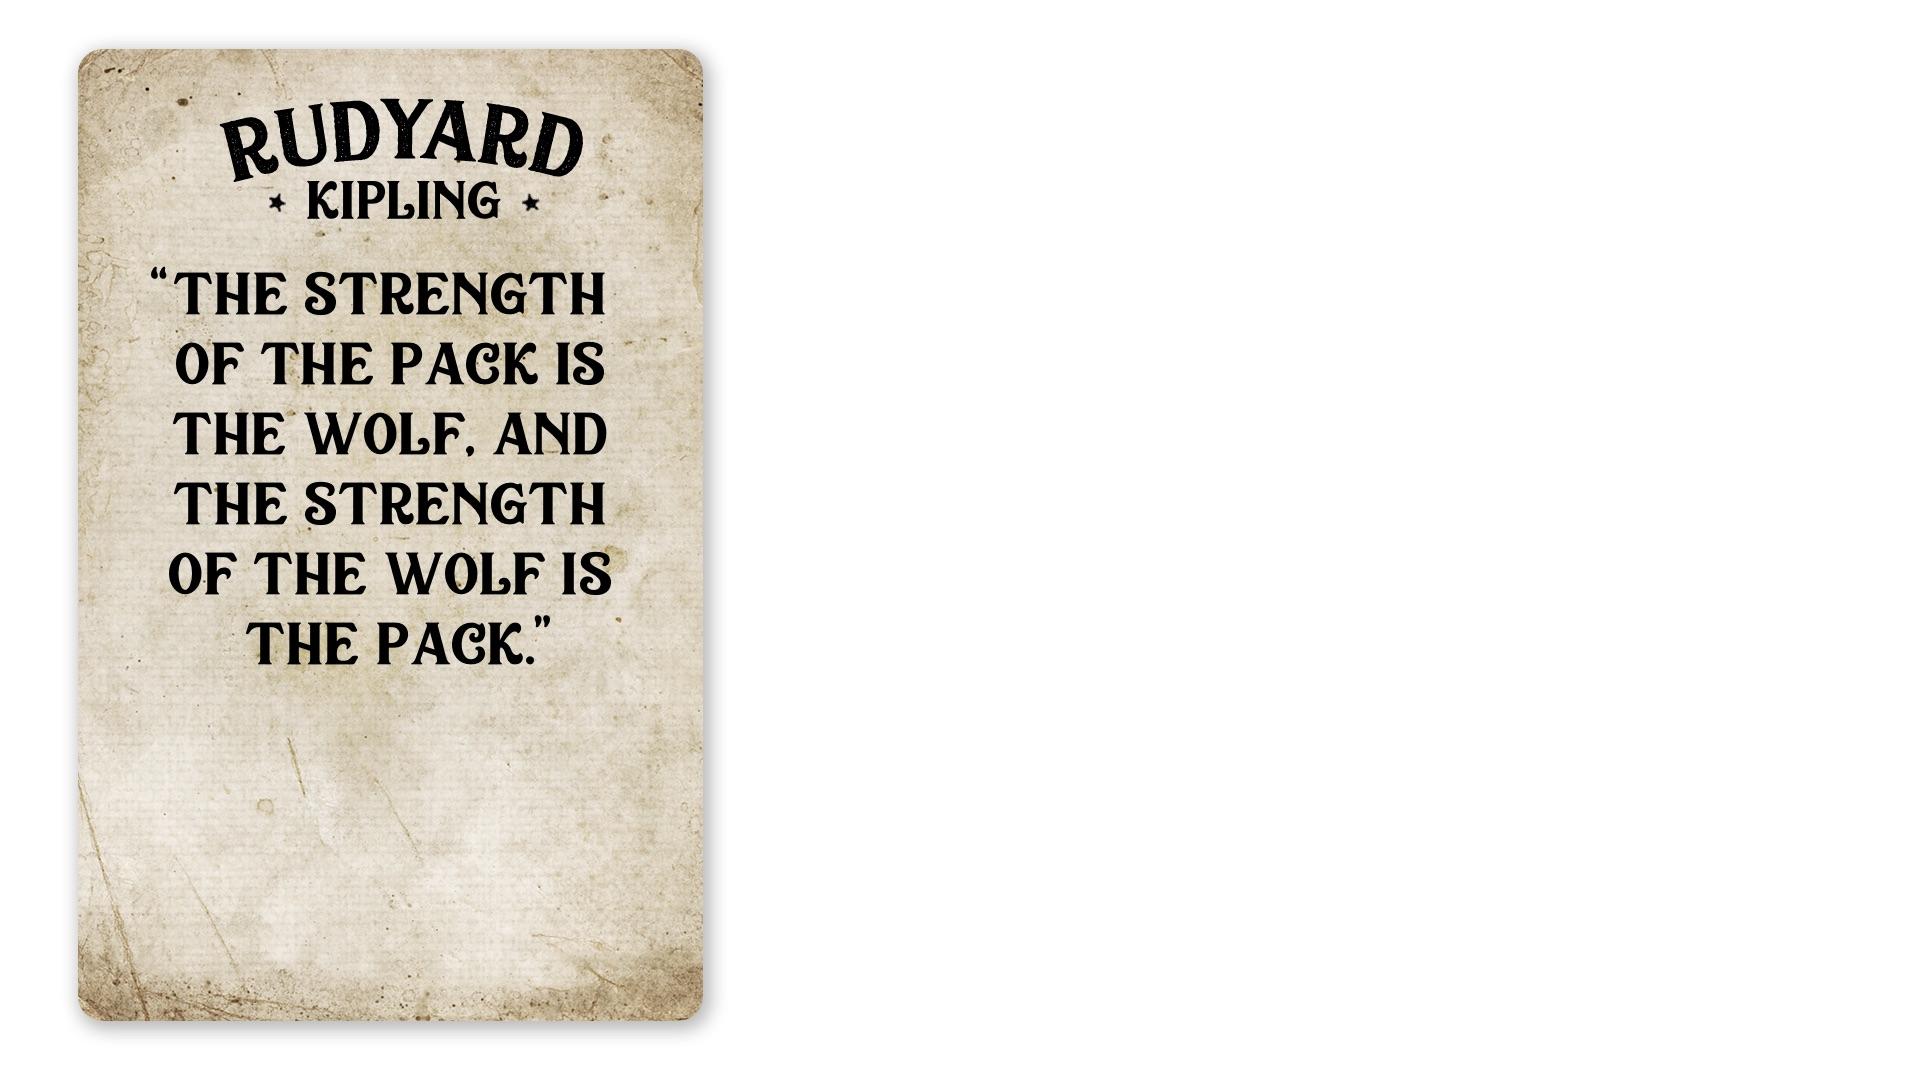 09 - Rudyard Kipling quote (PNG)